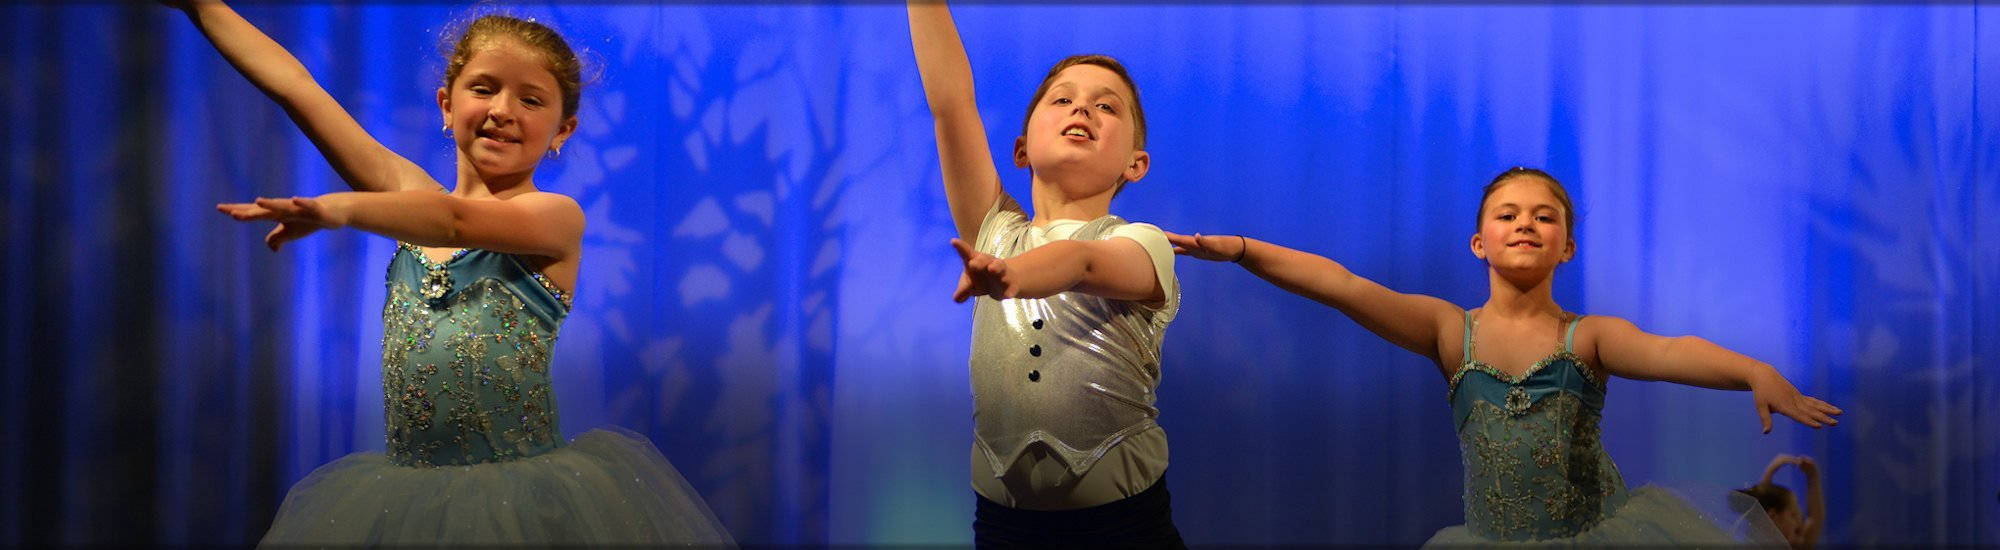 dance classes Hartford